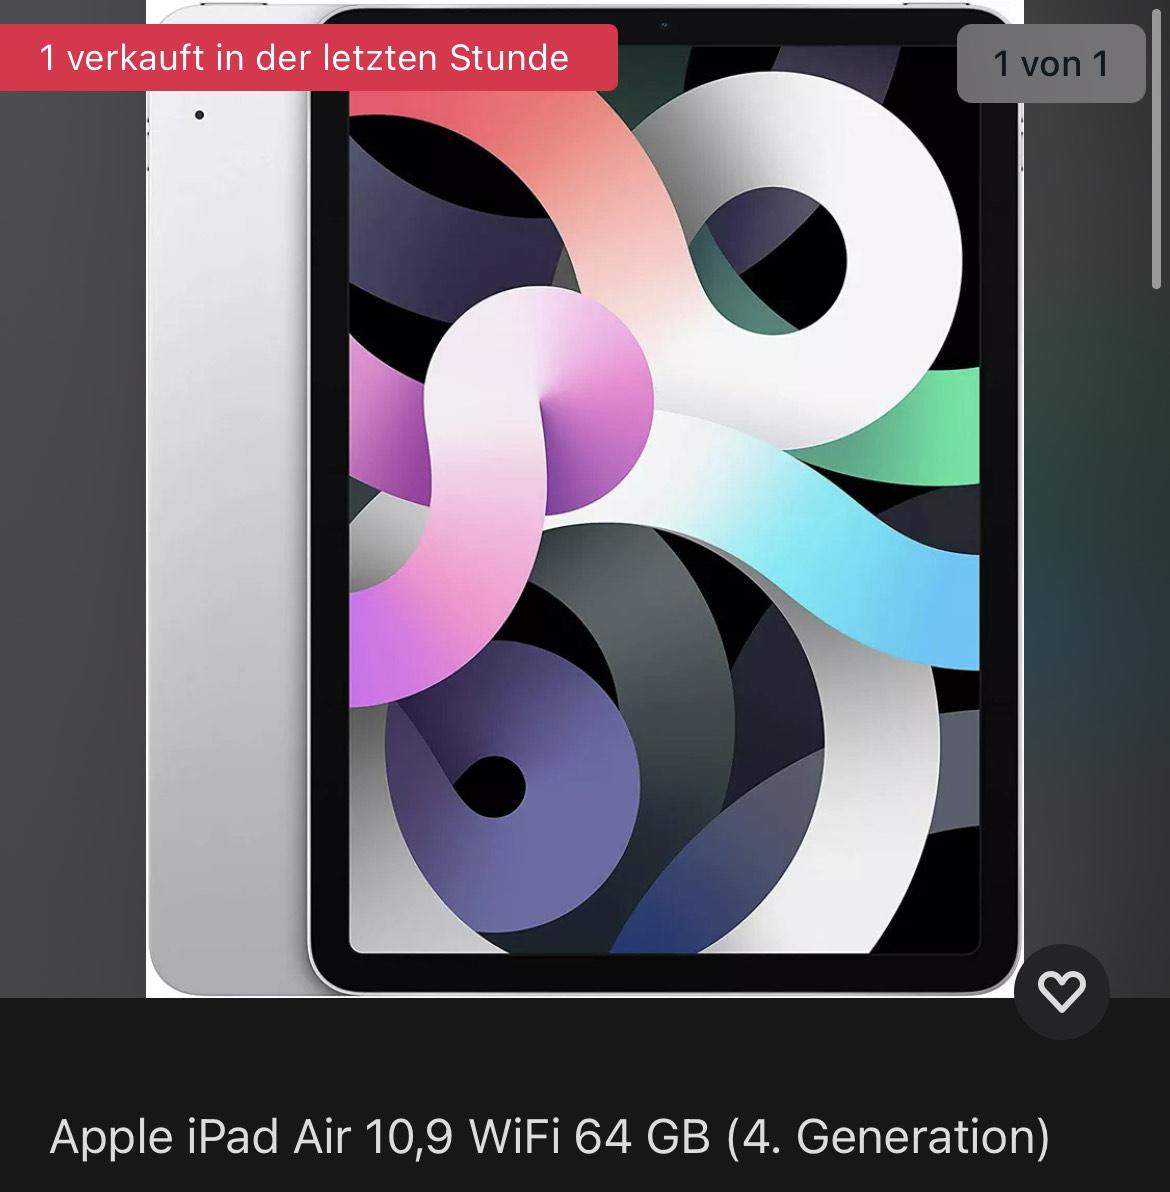 Apple iPad Air 10,9 WiFi 64 GB (4. Gen)